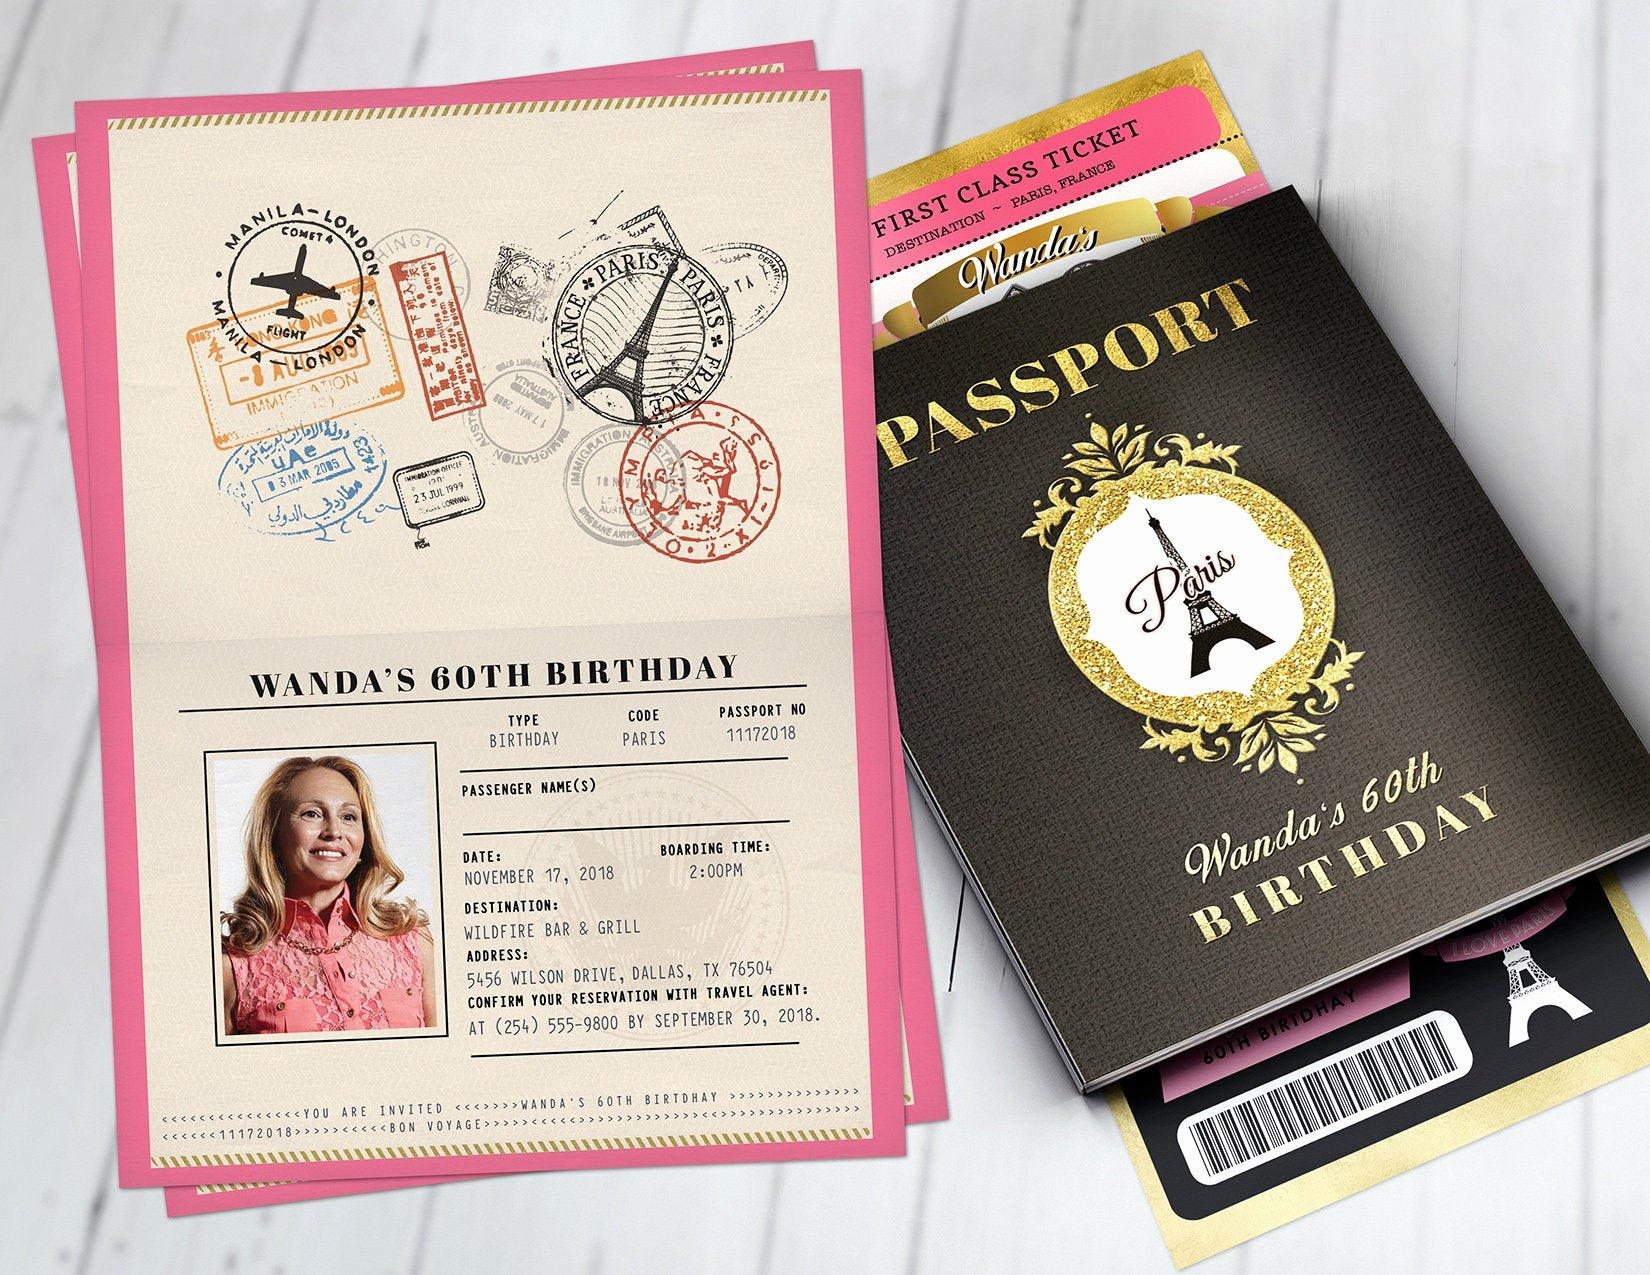 Paris Passport Invitation Template Fresh Passport and Ticket Birthday Invitation Paris Birthday